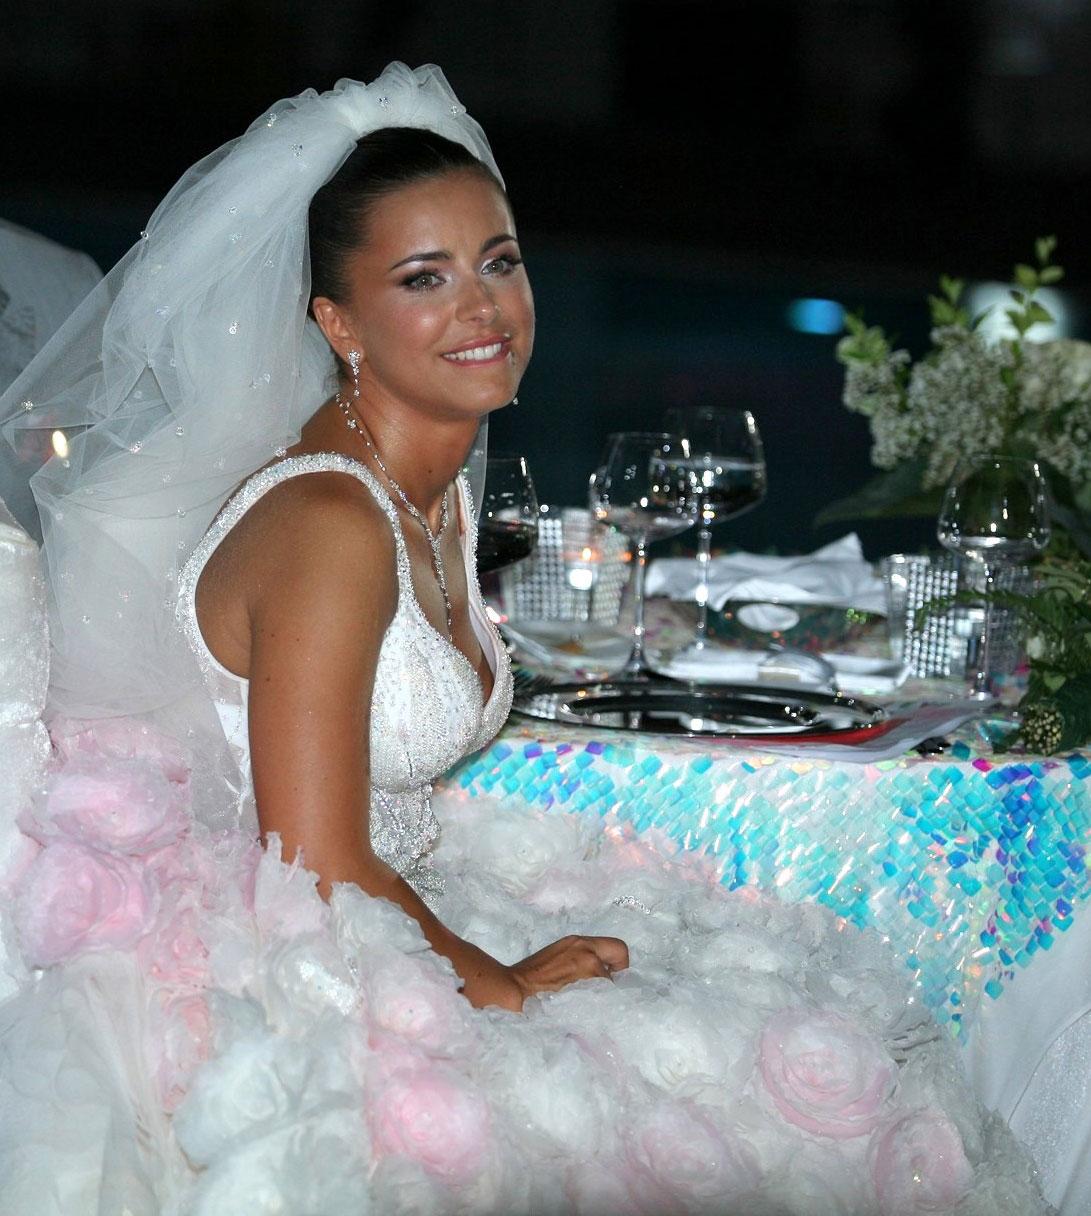 Картинки ани лорак свадьба